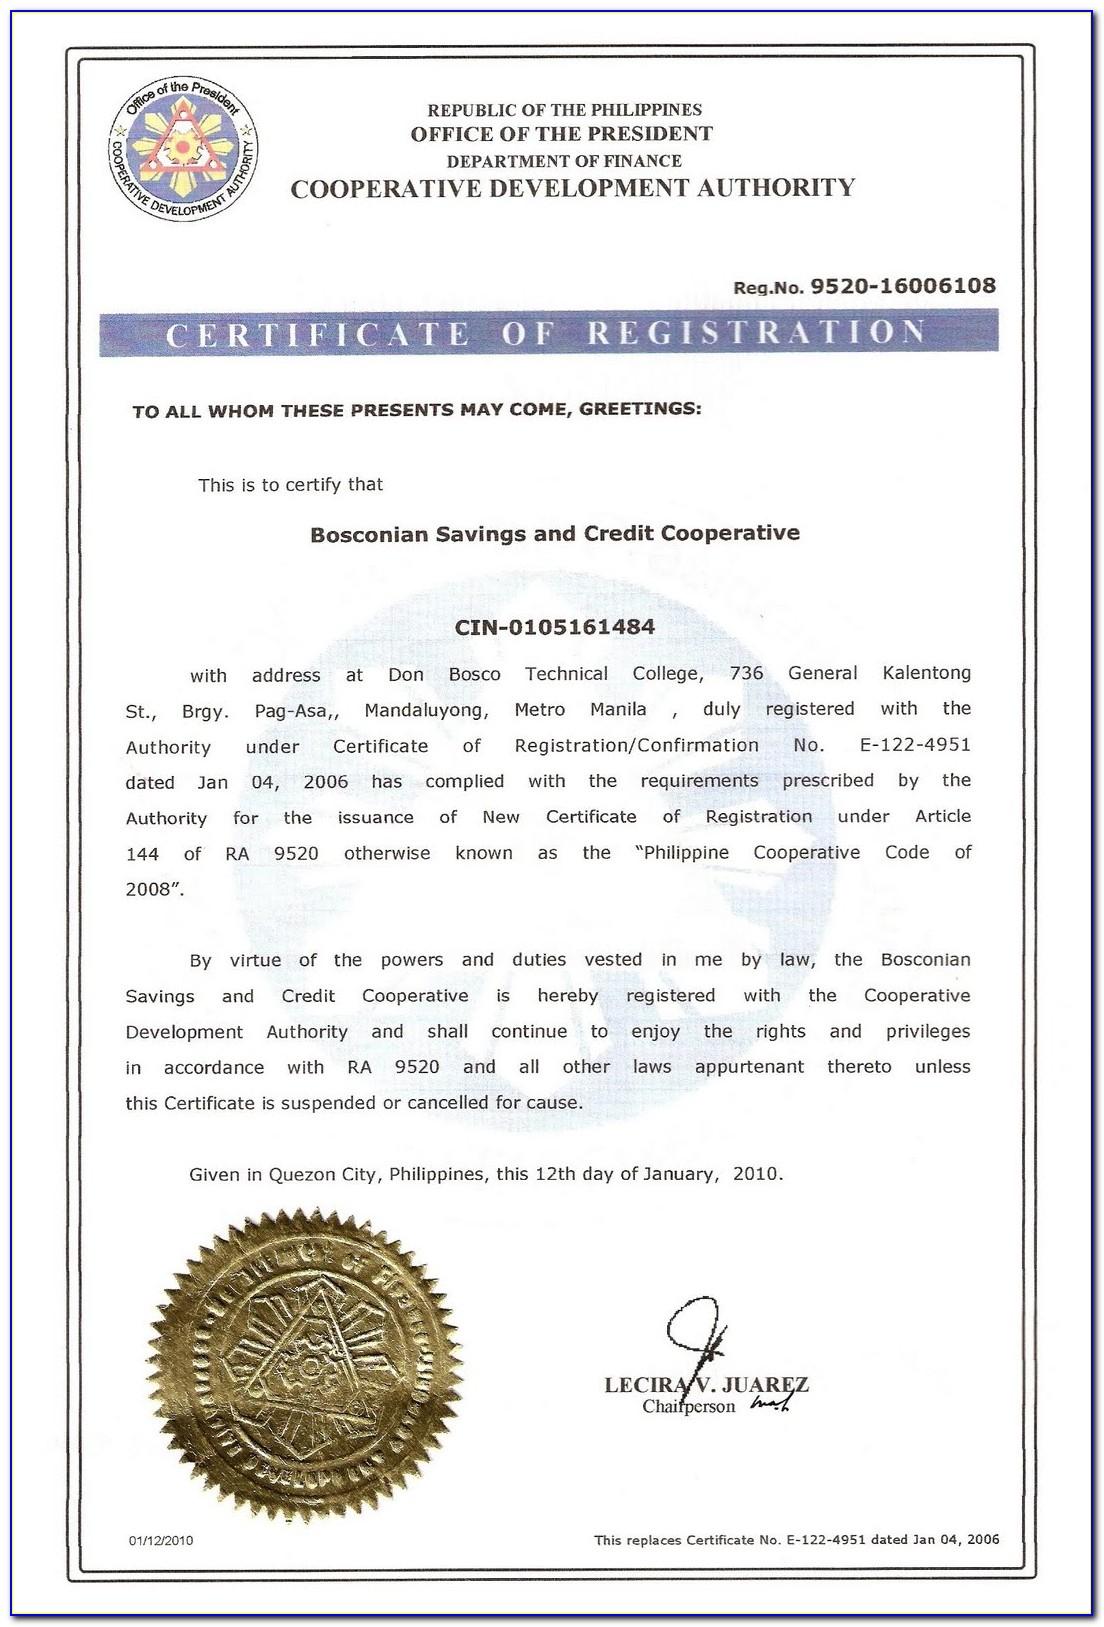 Cda Certification Bergen County Nj